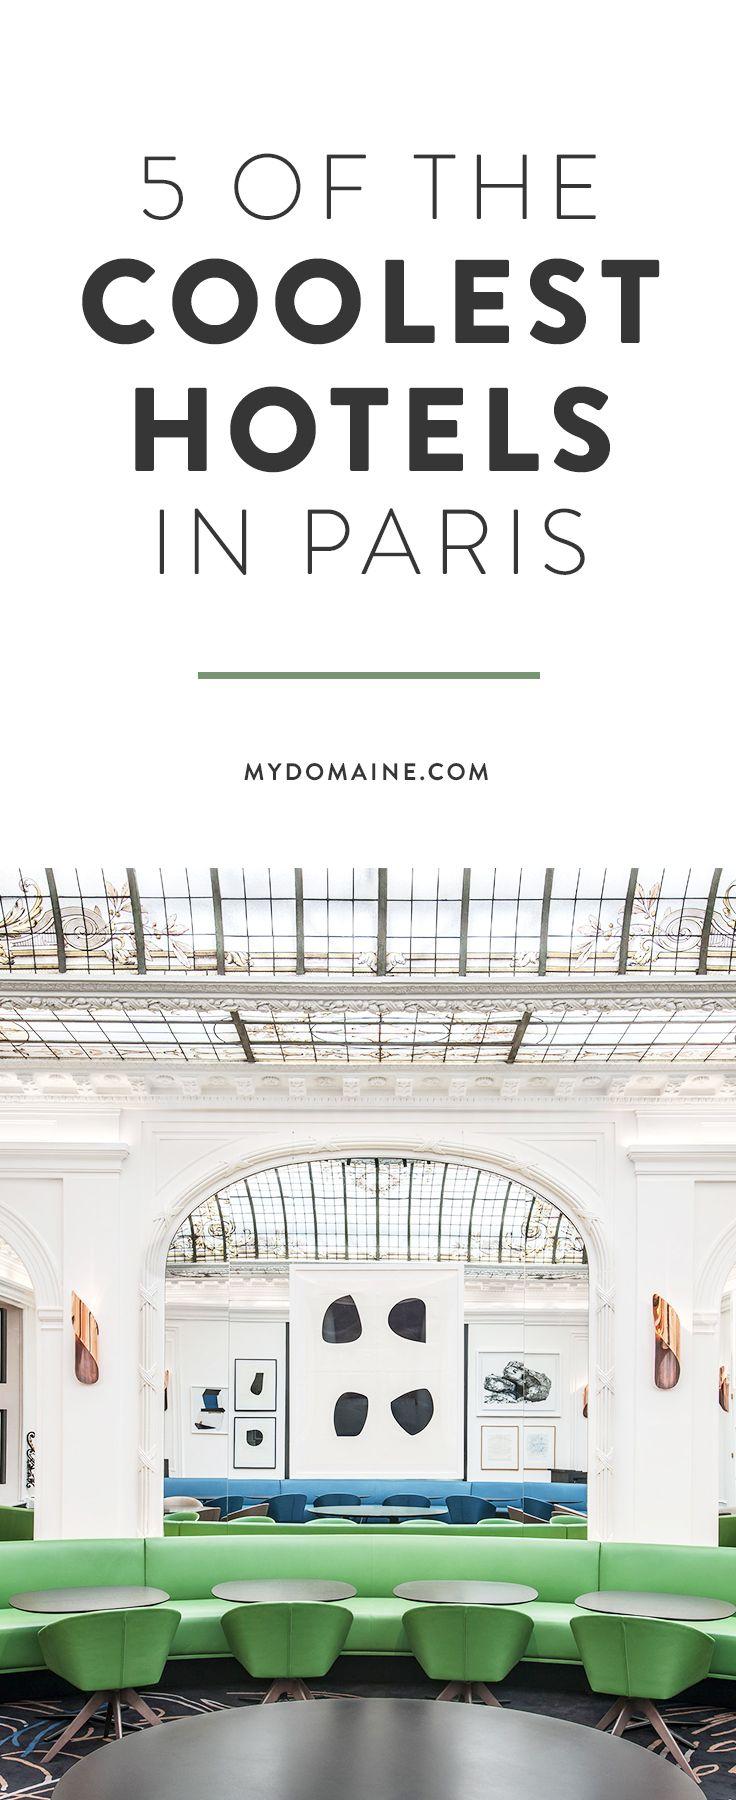 No wonder everyone travels to Paris...